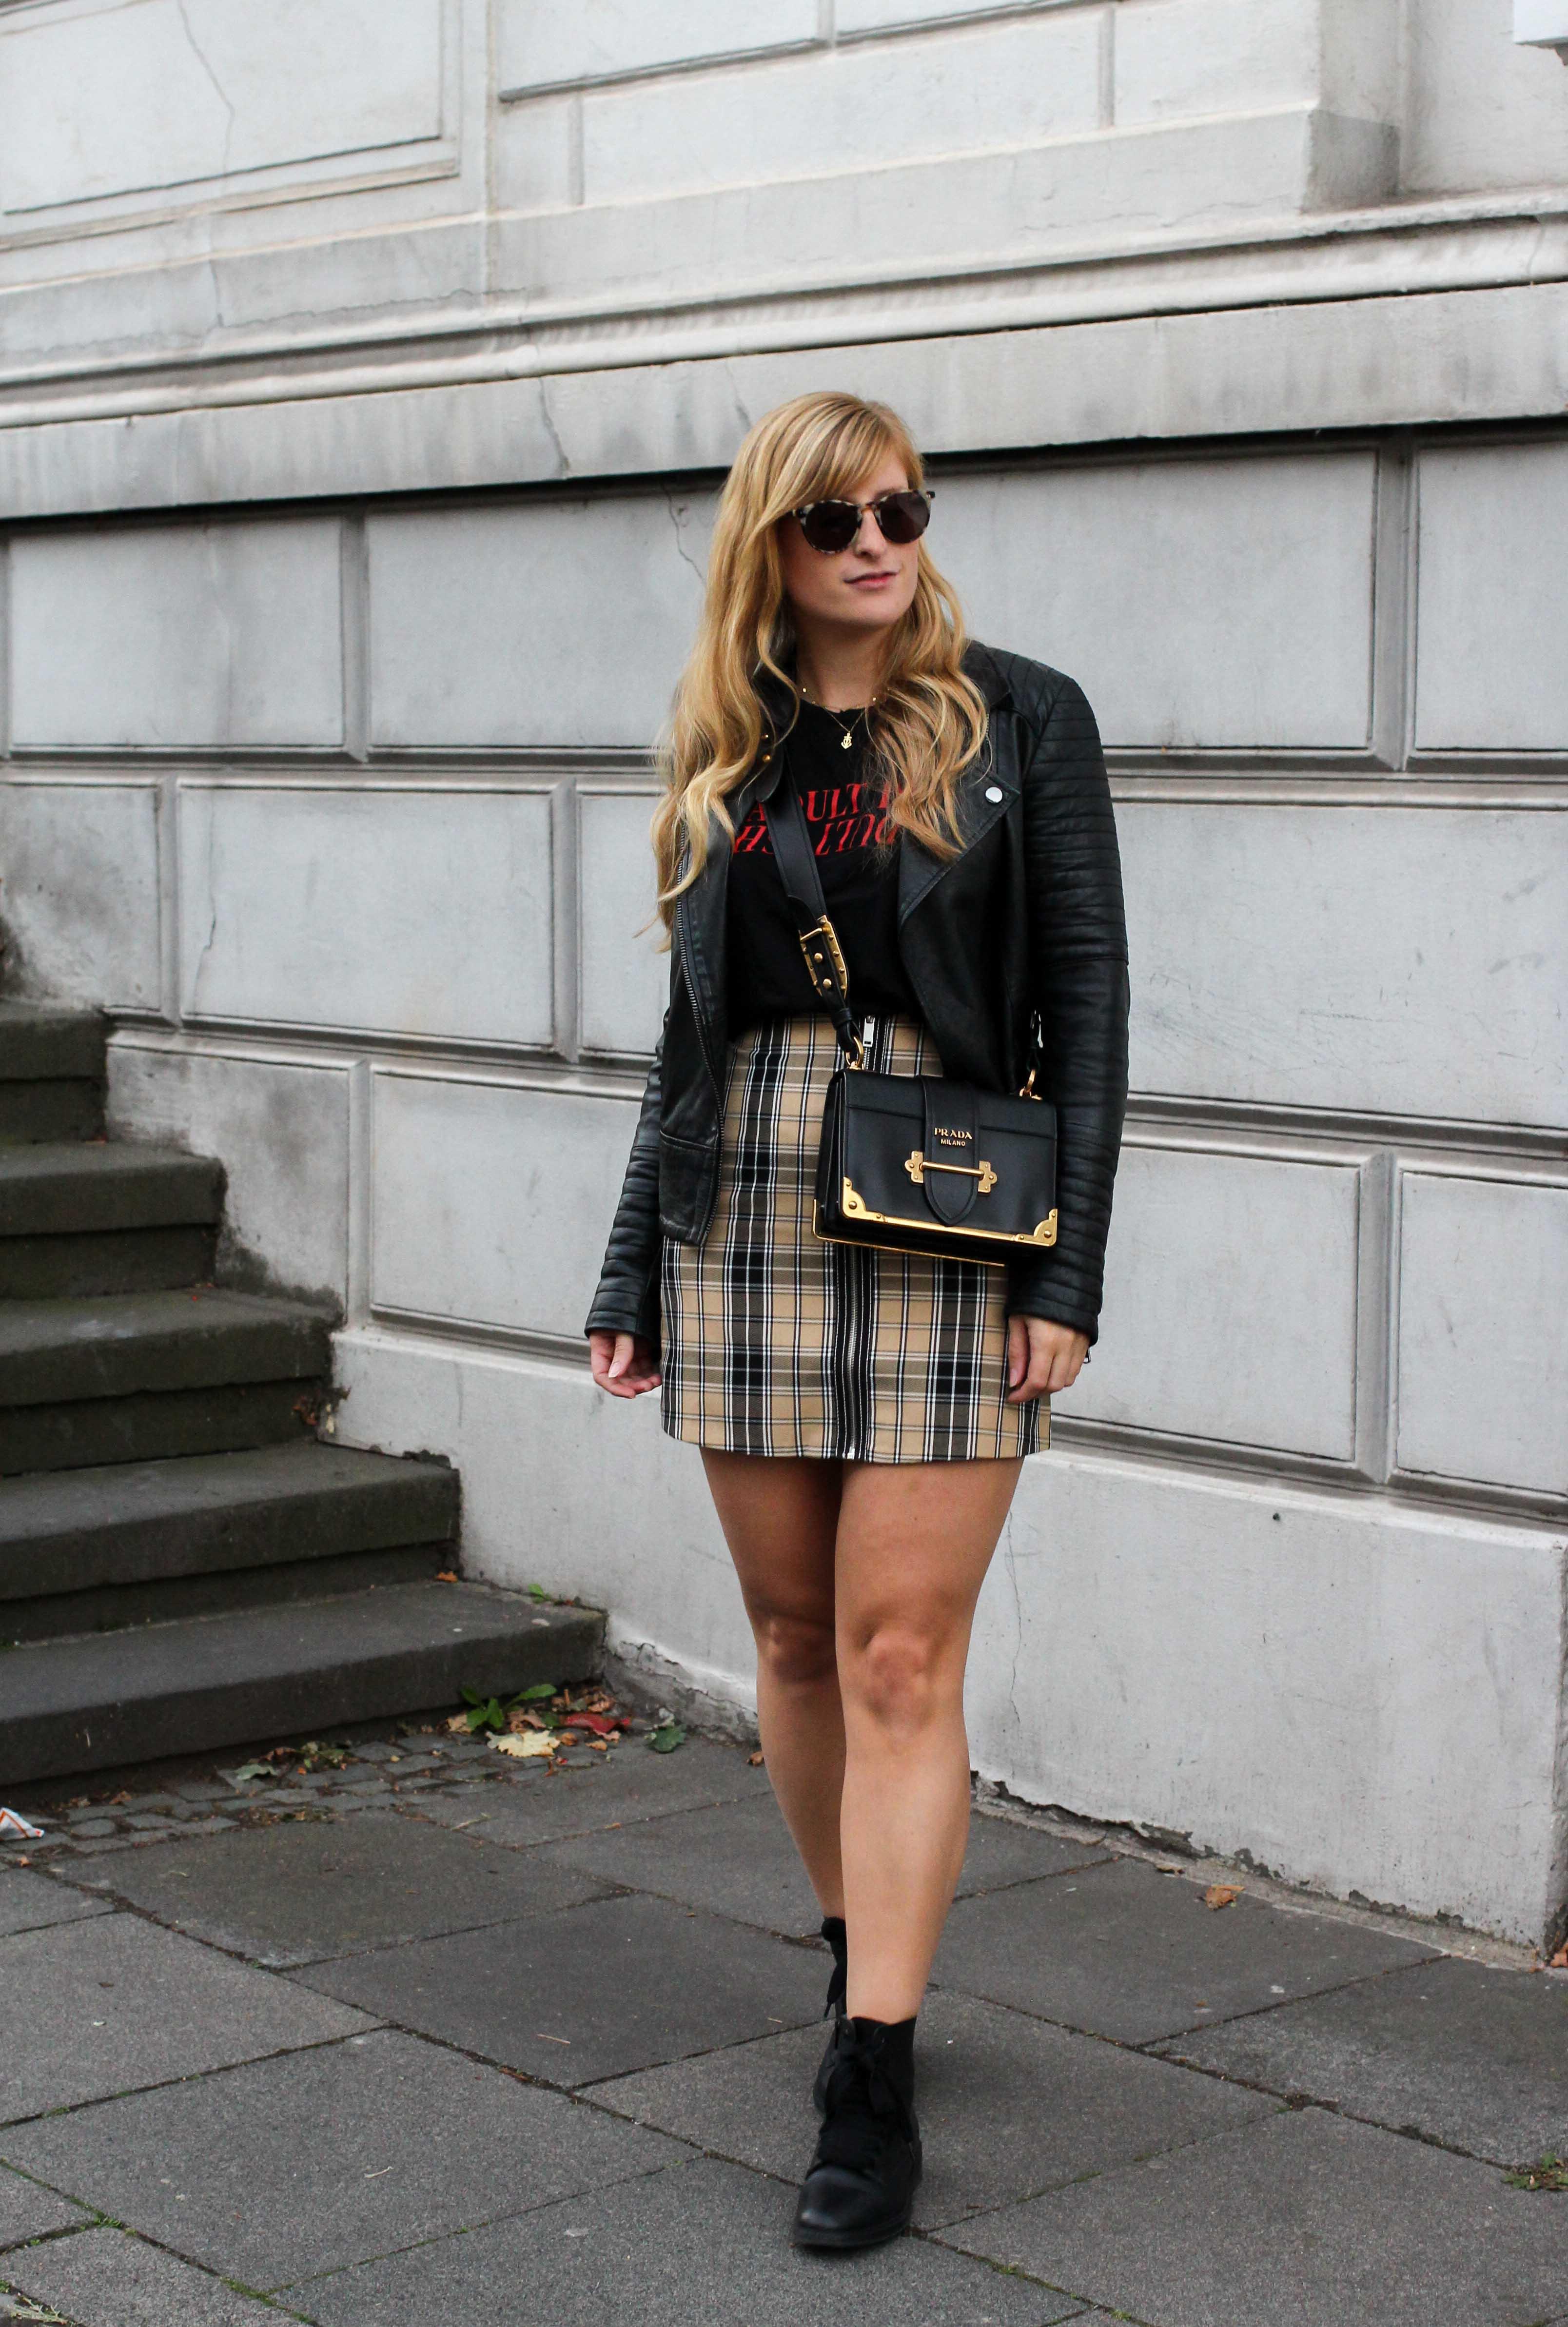 Outfit Karorock kombinieren Lederjacke Schleifenboots Übergangslook Modeblog Prada Cahier Tasche schwarz Bonn 1